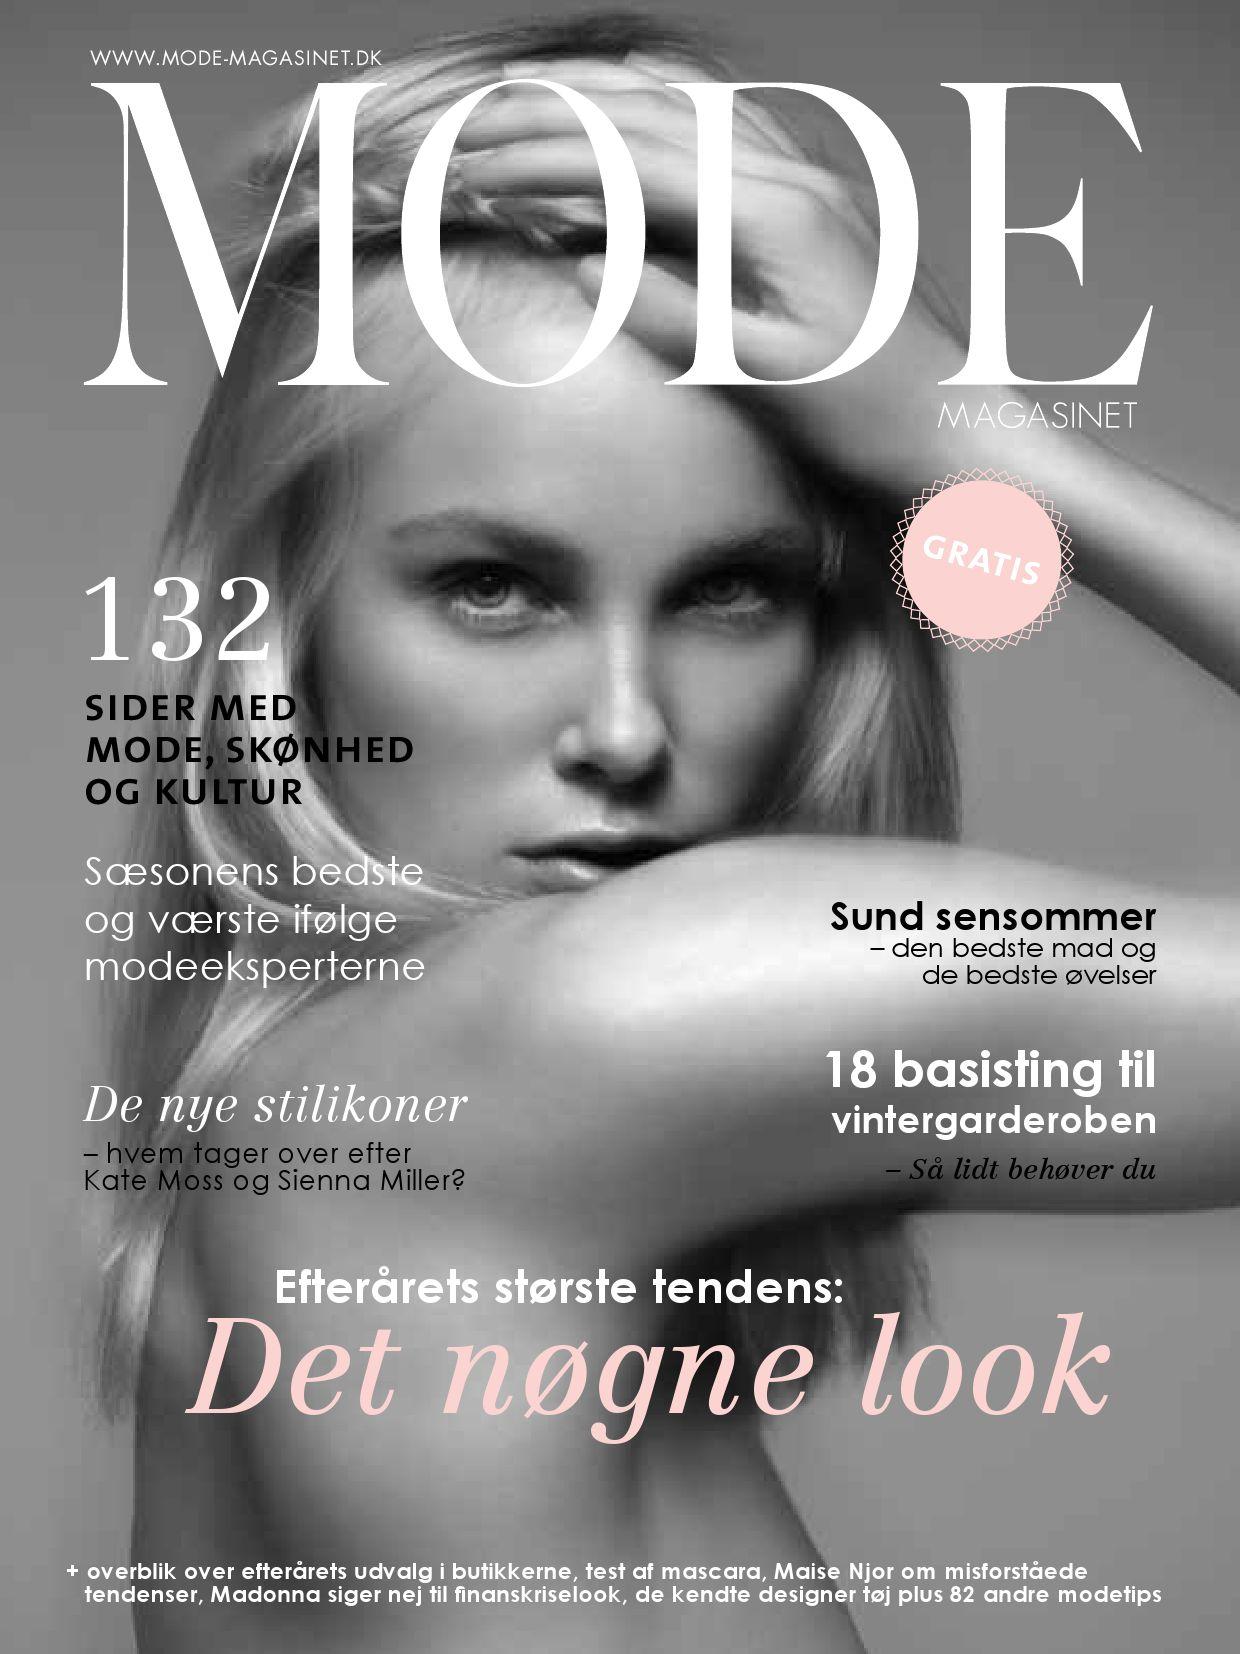 fc2a18f442bd ModeMagasinet august09 by Mathilde Holkenfeldt Behrendt - issuu